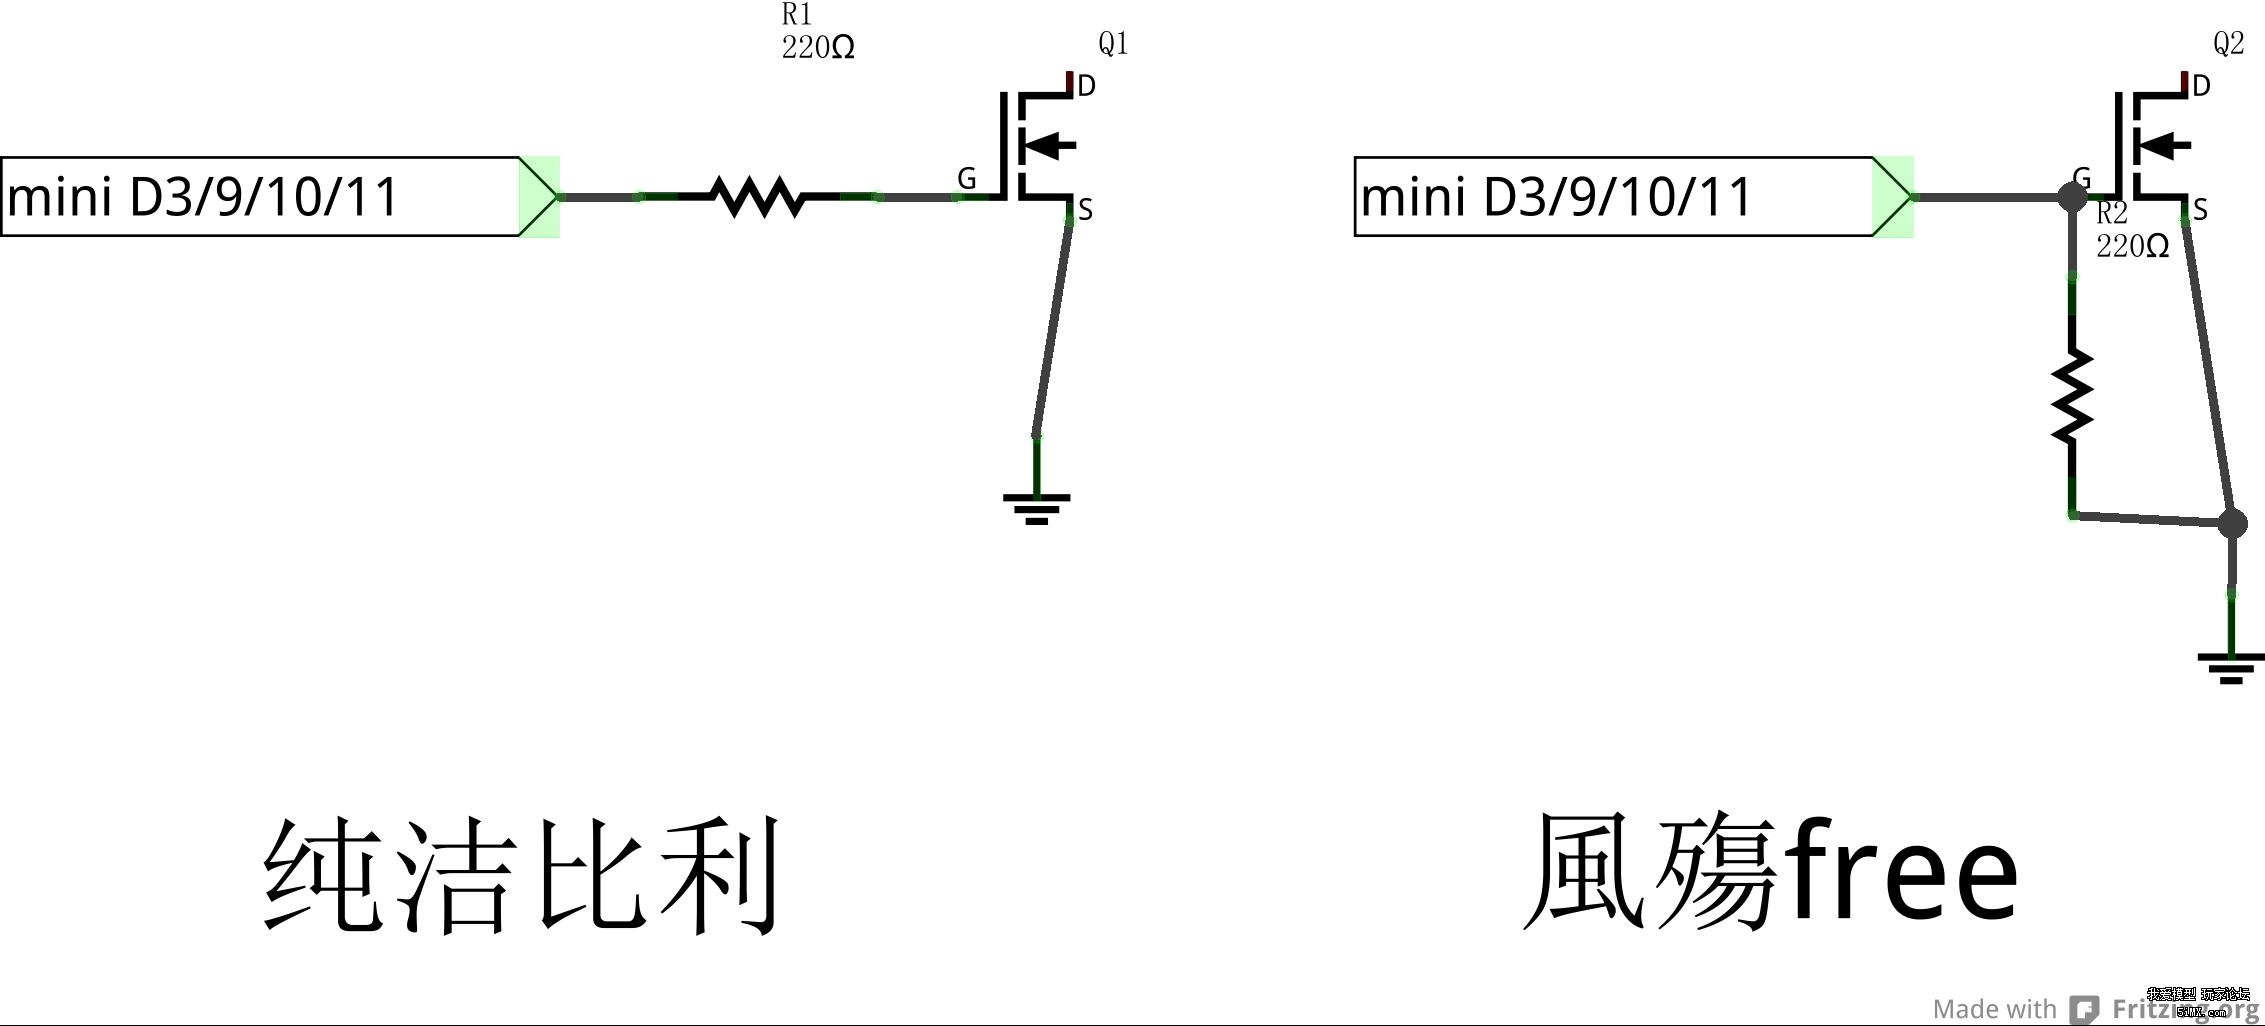 [size=10.5000pt]我认为有个下拉的电阻会好些,但是我按風殤free的接法连接MOS管后,MOS管的G、S之间总是被击穿,上电后电机就会转。击穿前S-G基本是开路的(20M档测),S-G的阻值只有100~300,已经烧了8个管子(试了2次)。 [size=10.5000pt] [size=10.5000pt]这是什么原因? [size=10.